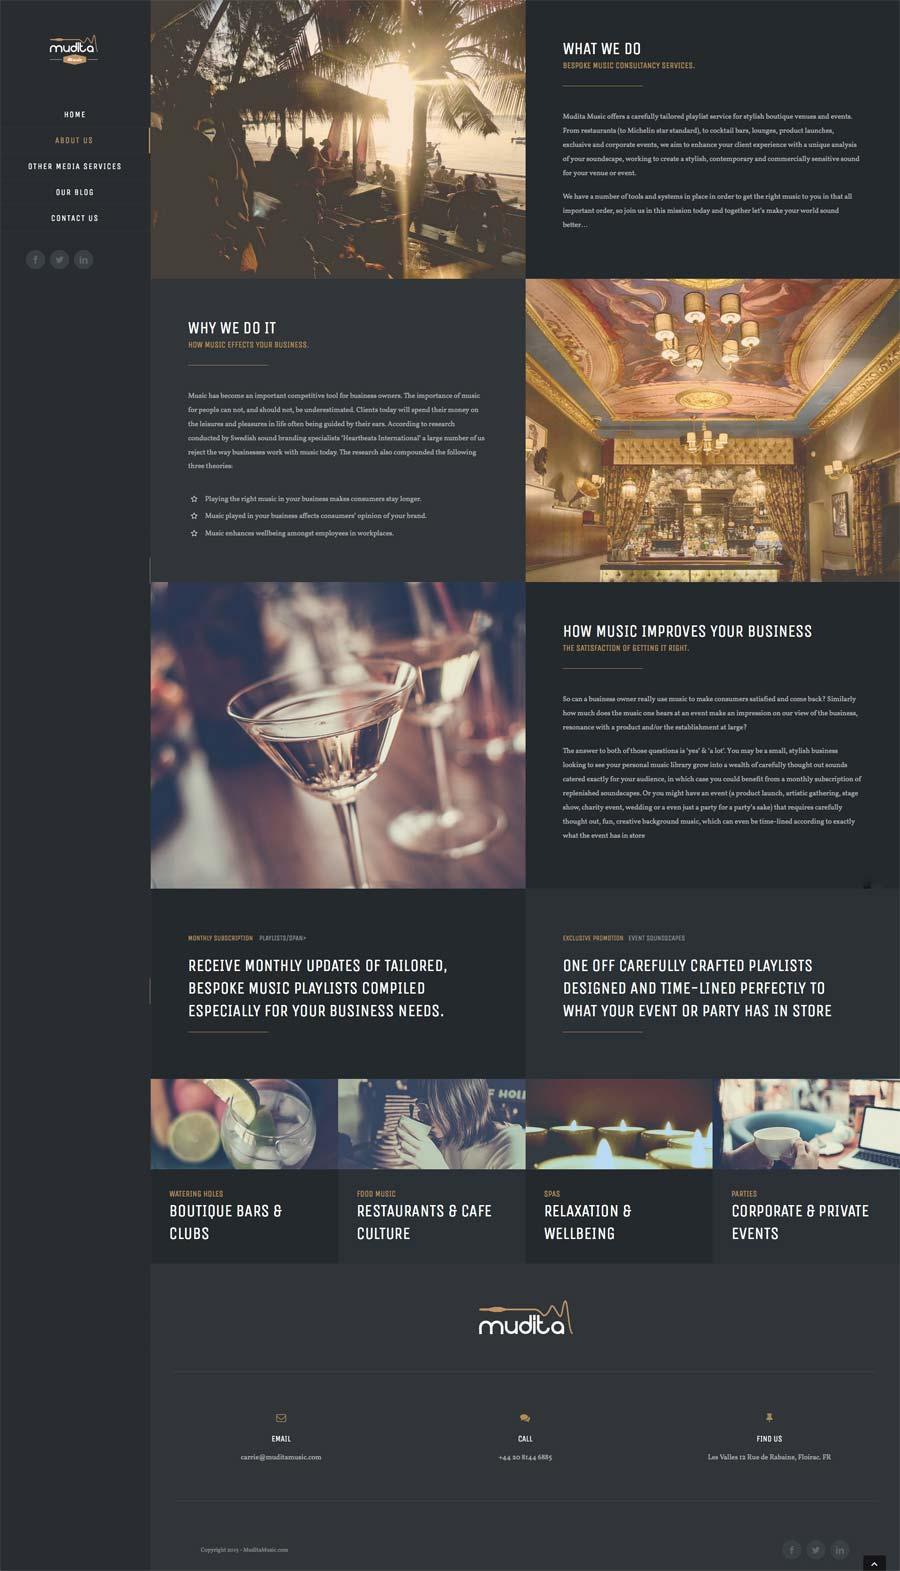 Mudita music - Responsive, Web Design, WordPress